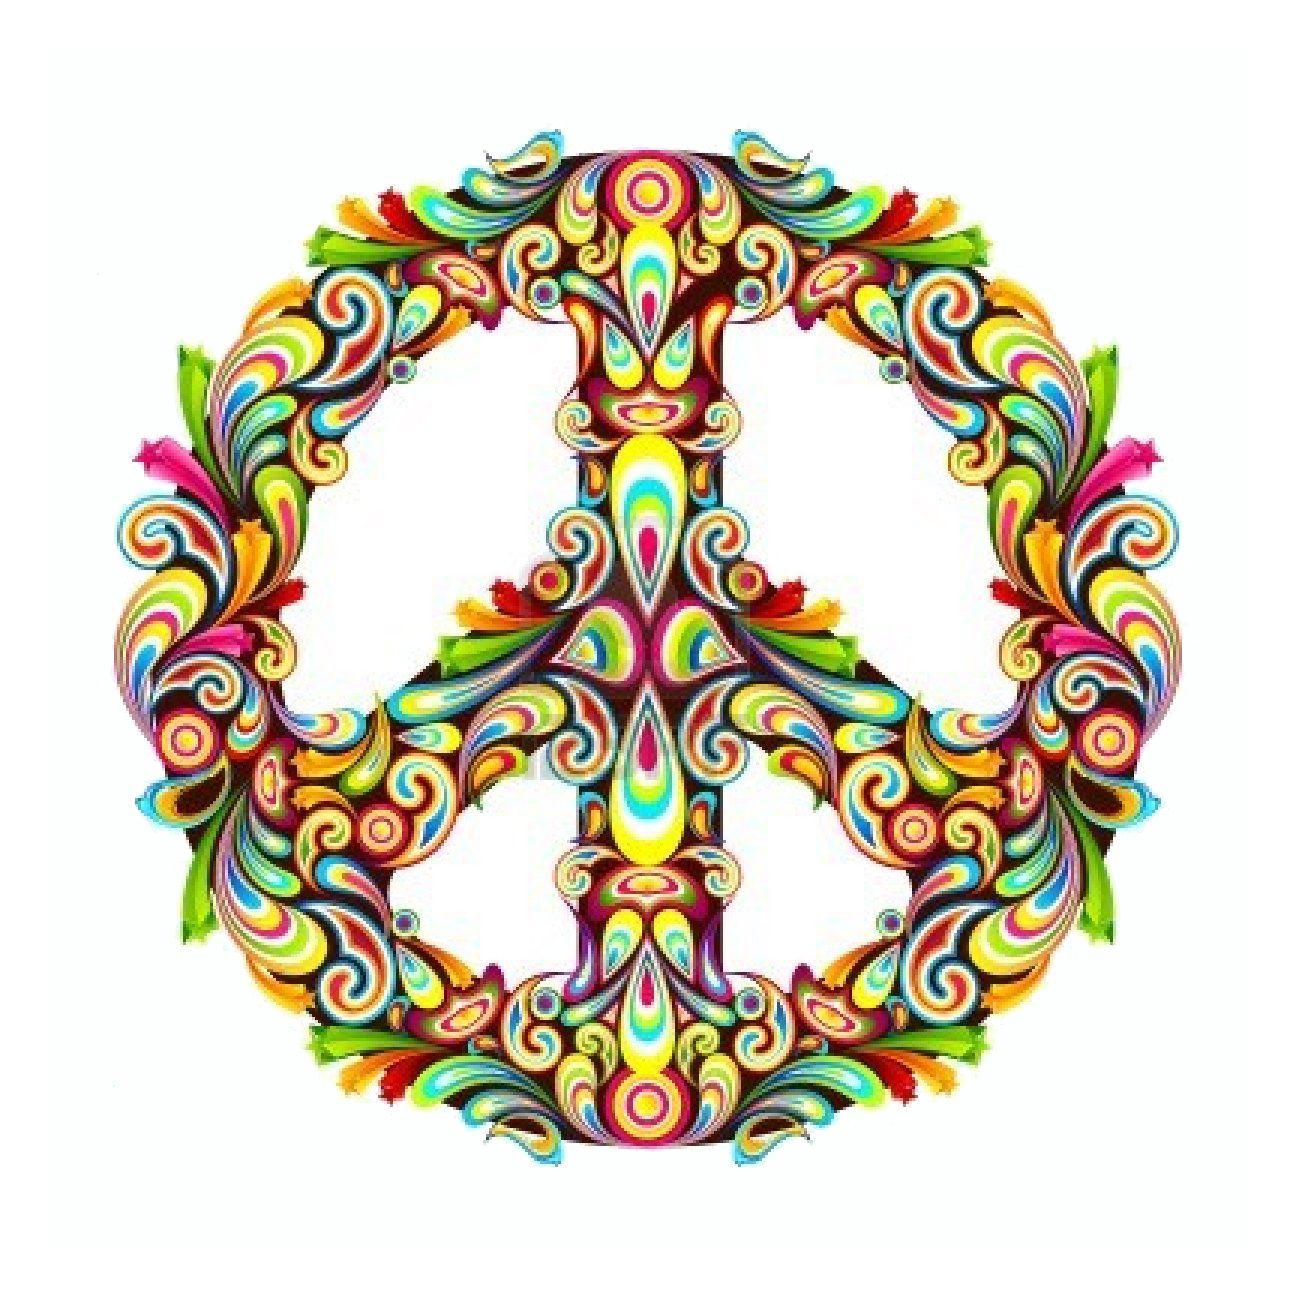 1296x1296 Peace Blogs World Peace Through Technology Ceramics